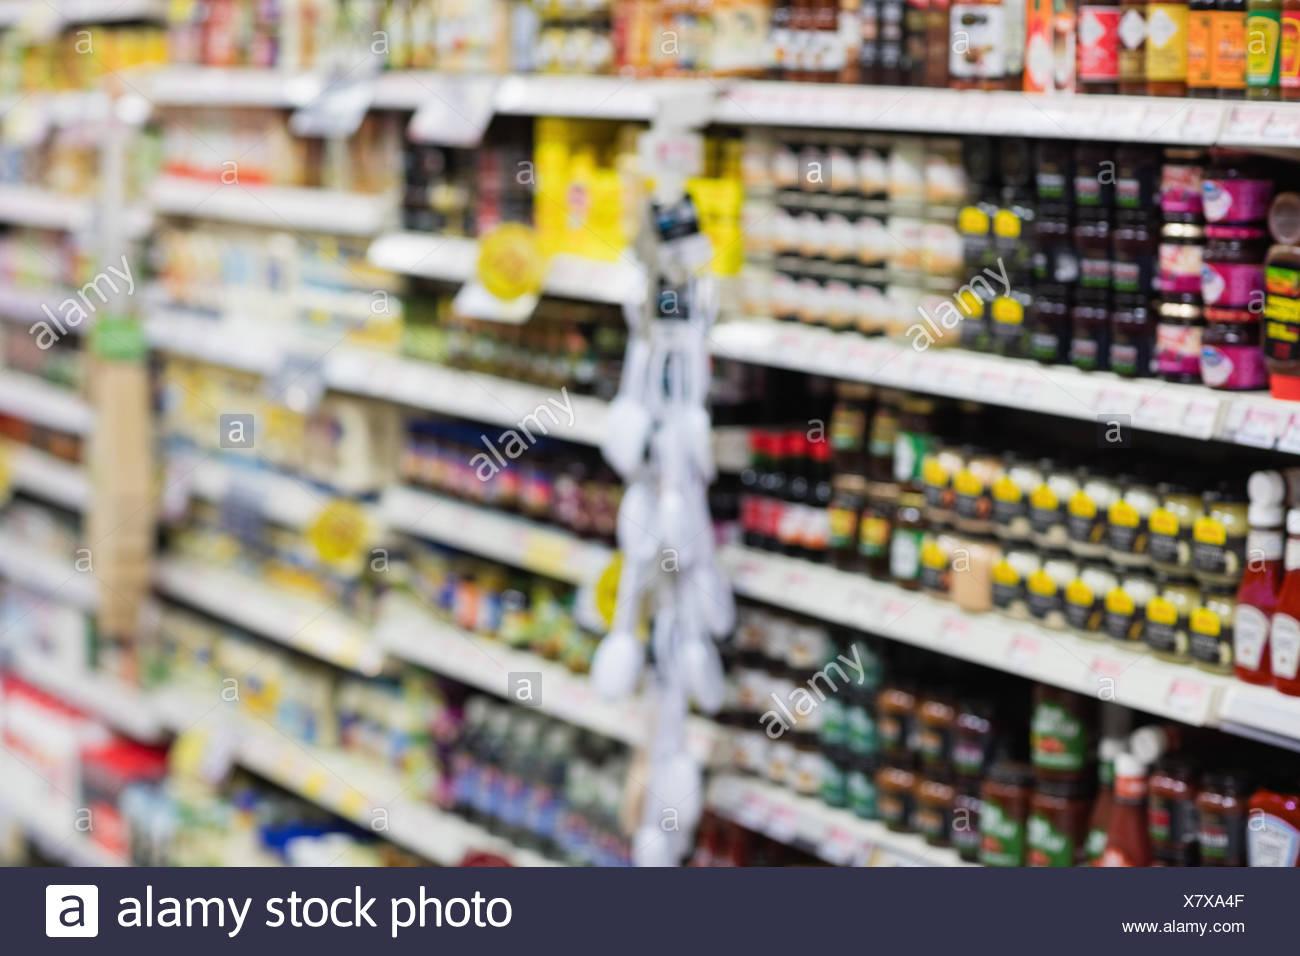 Side view of supermarket shelves - Stock Image